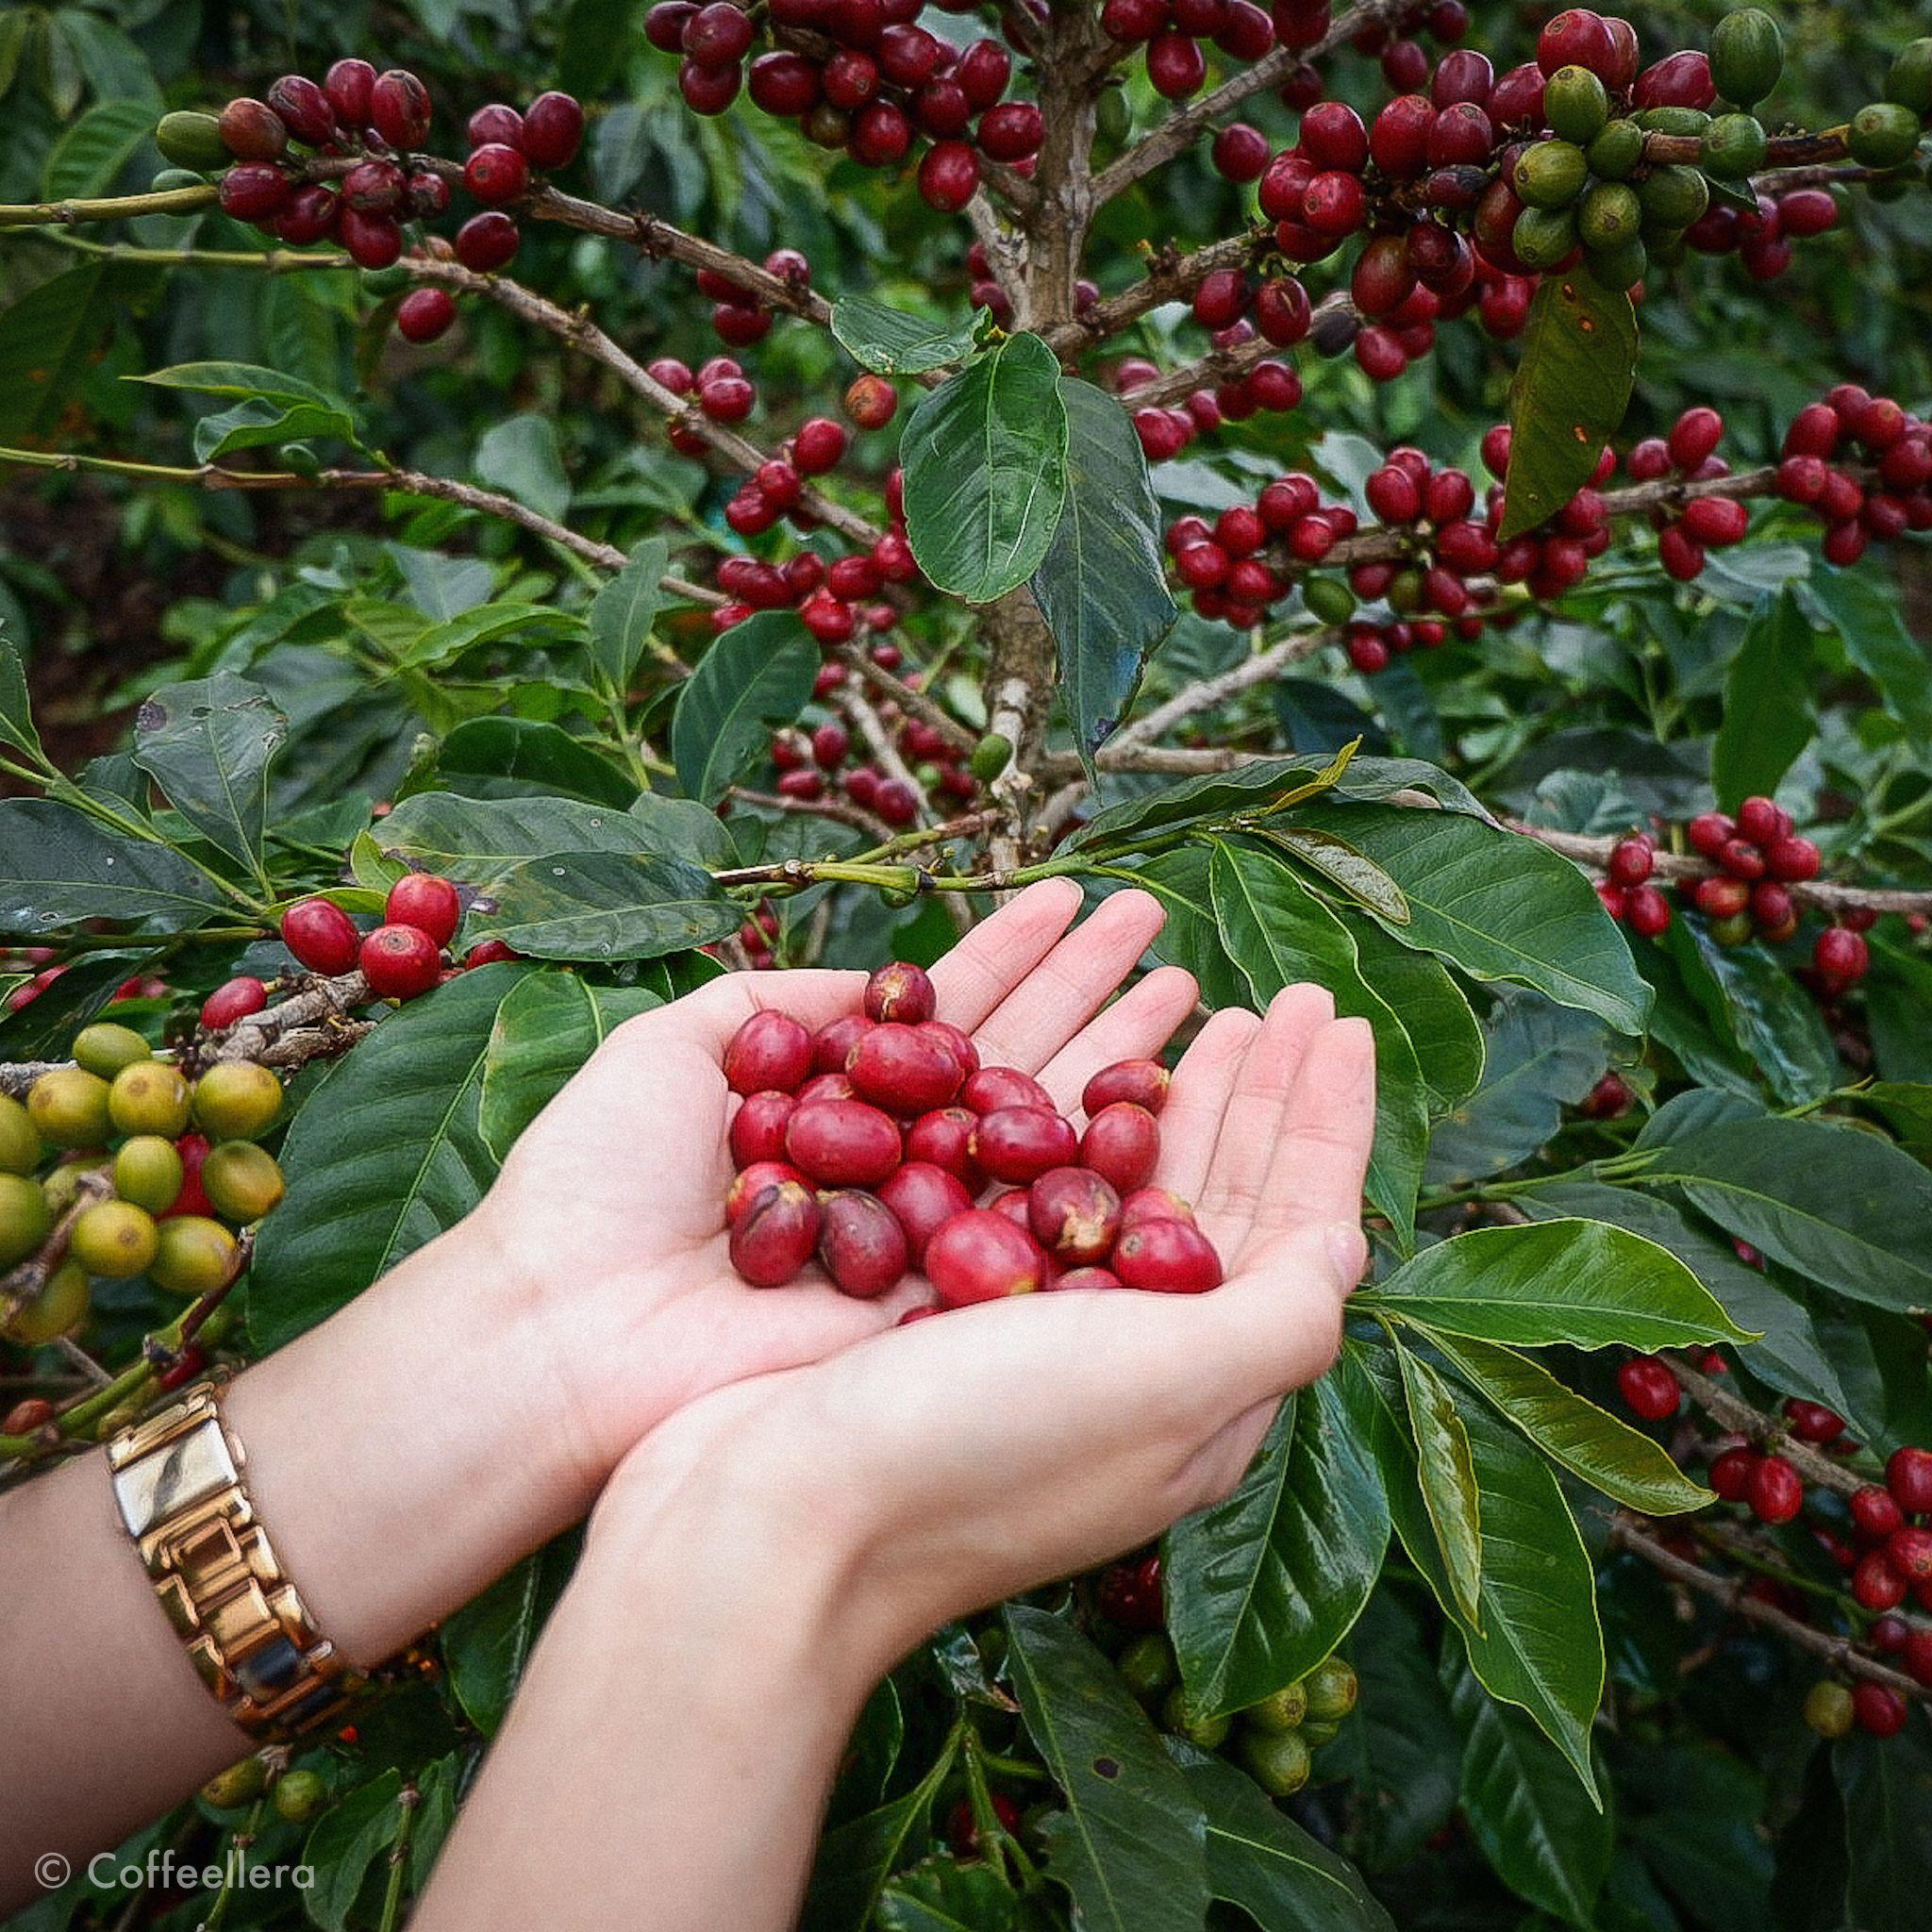 Philippine Coffee Beans